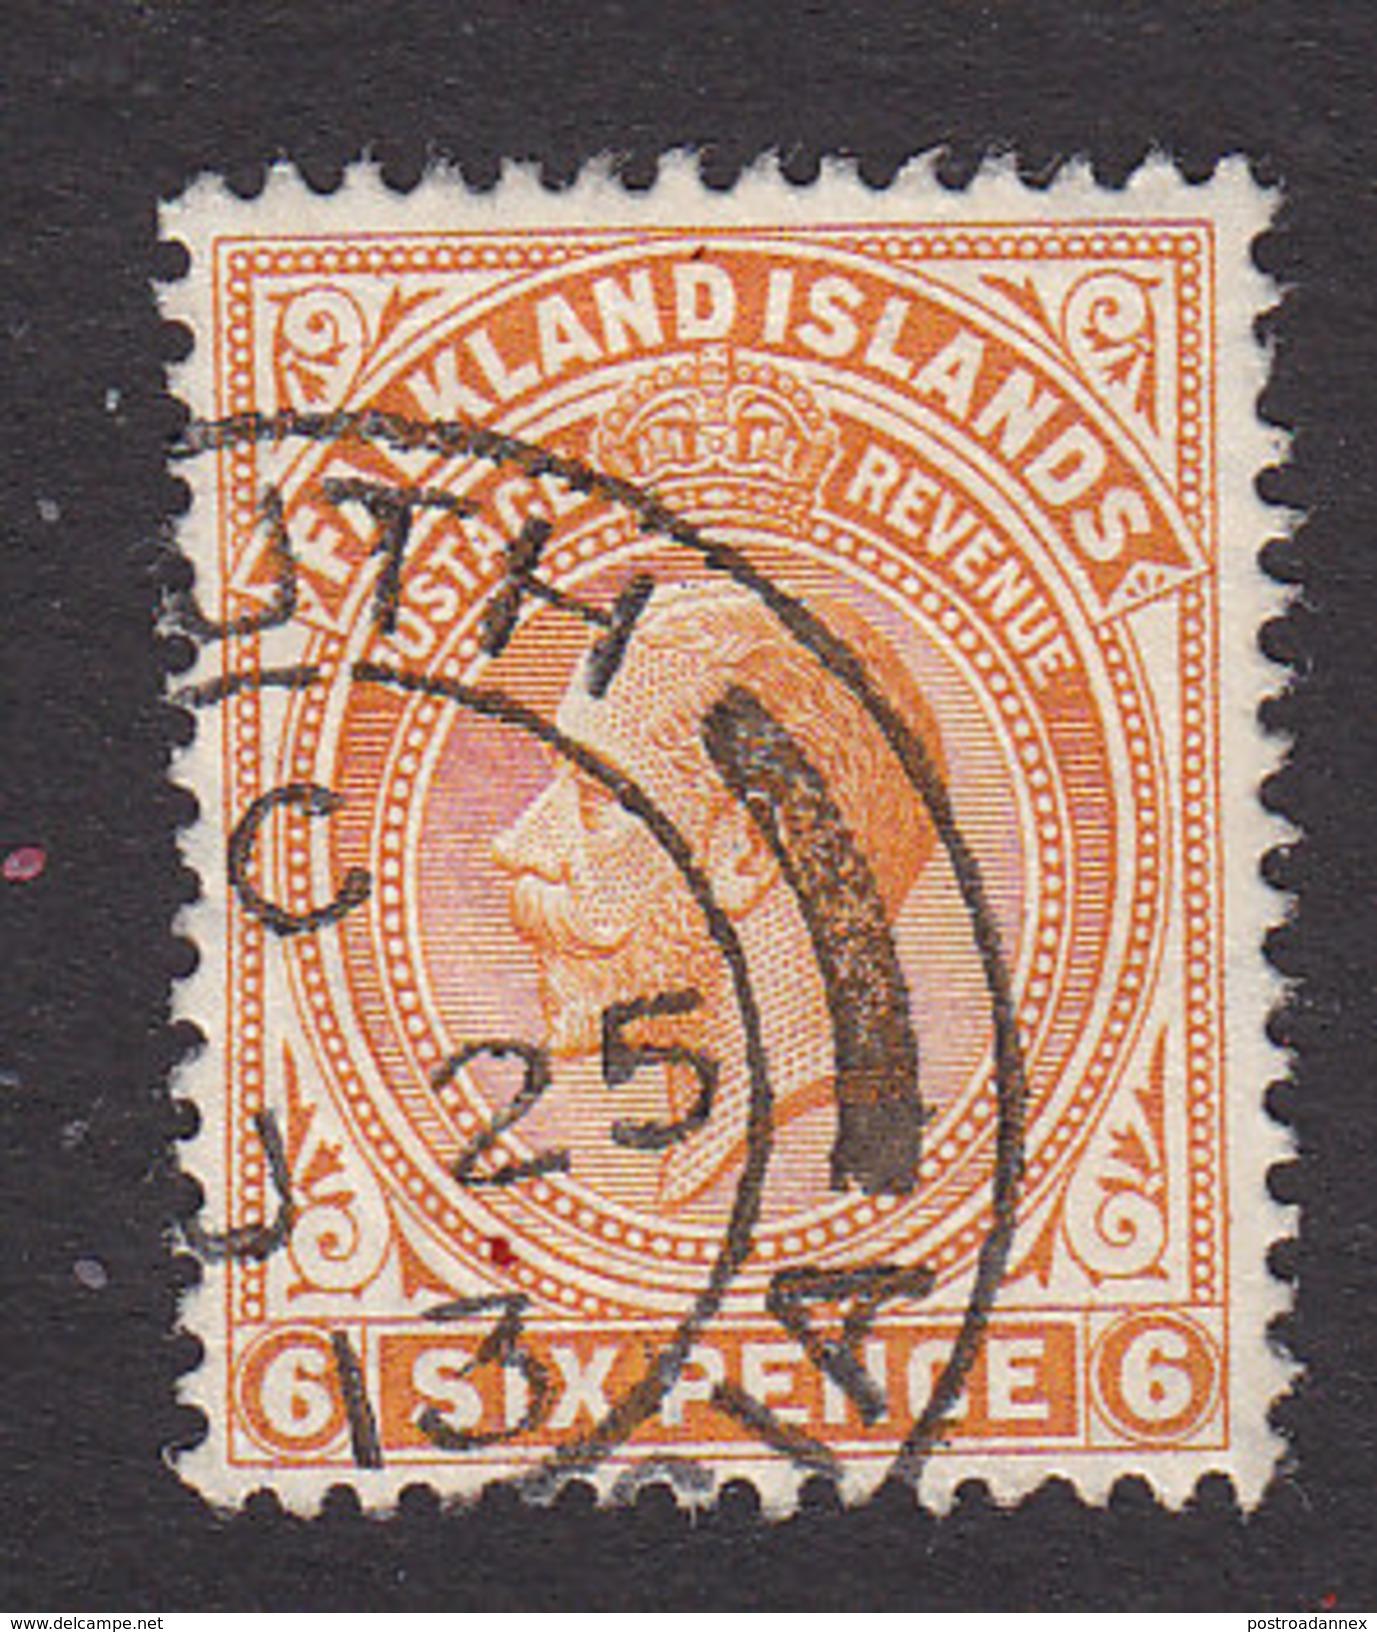 Falkland Islands, Scott #34, Used, George V, Issued 1912 - Falkland Islands